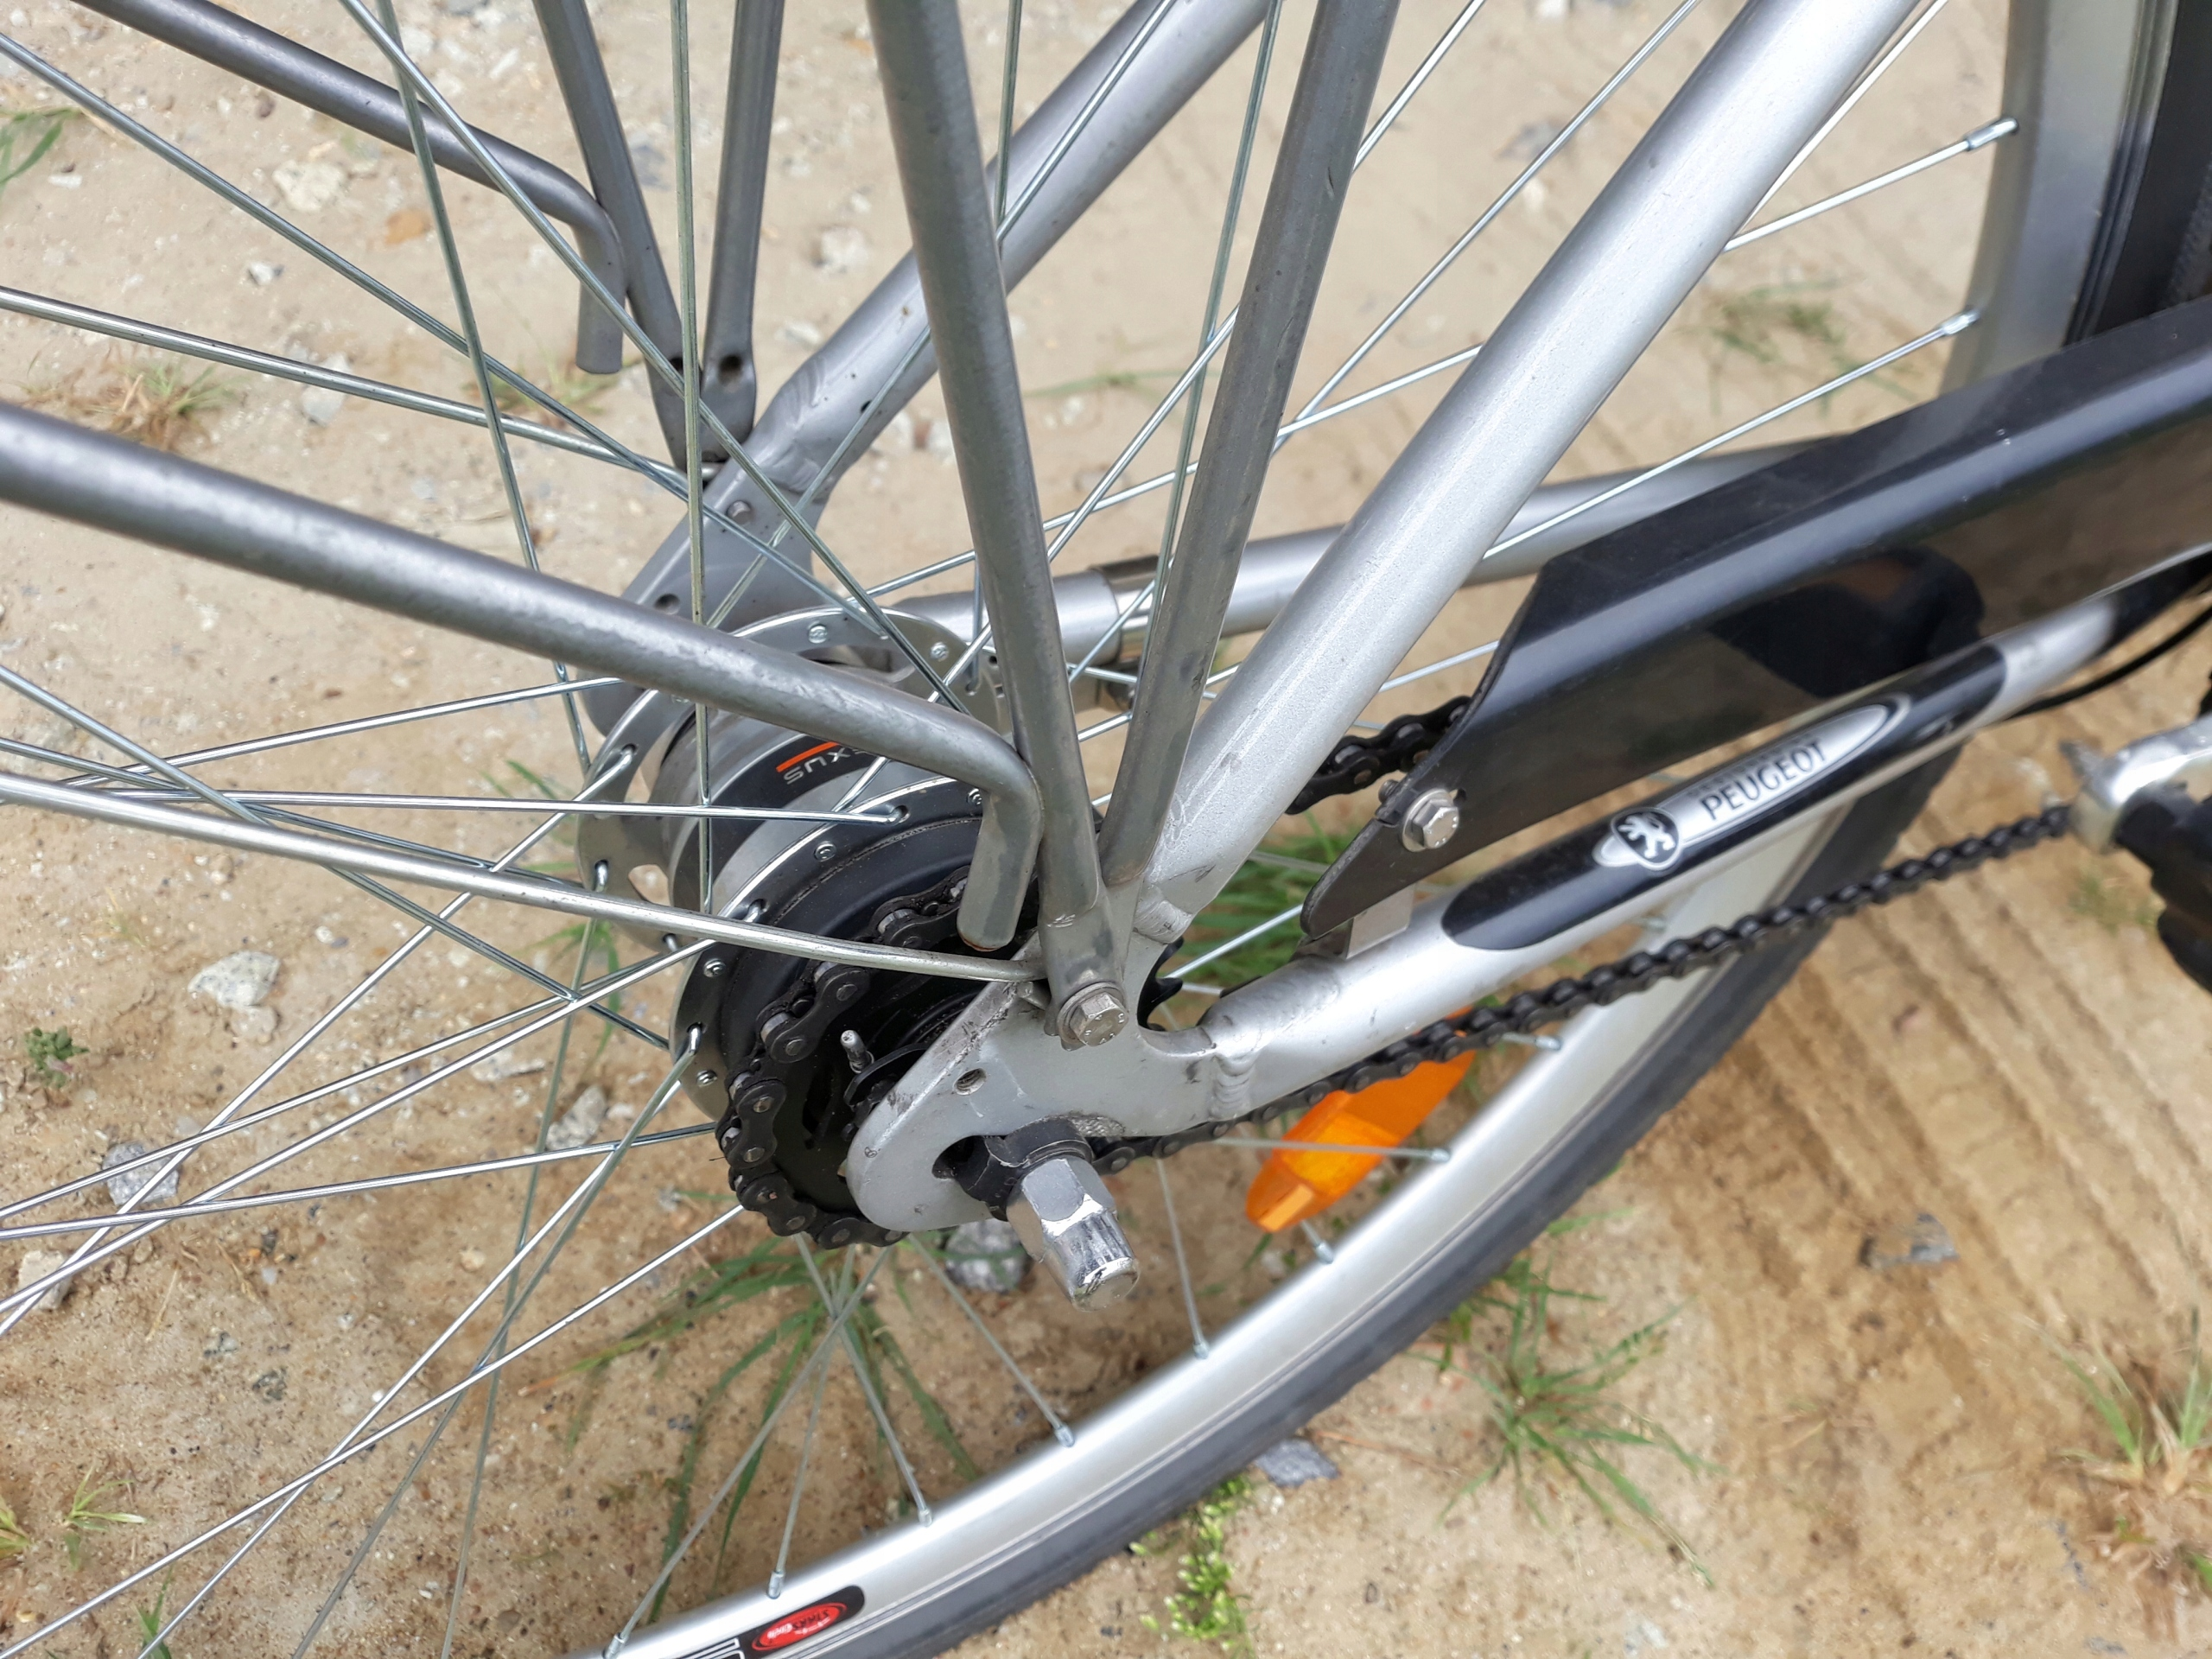 rower peugeot corona 7005 7 biegow aluminium - 7568853543